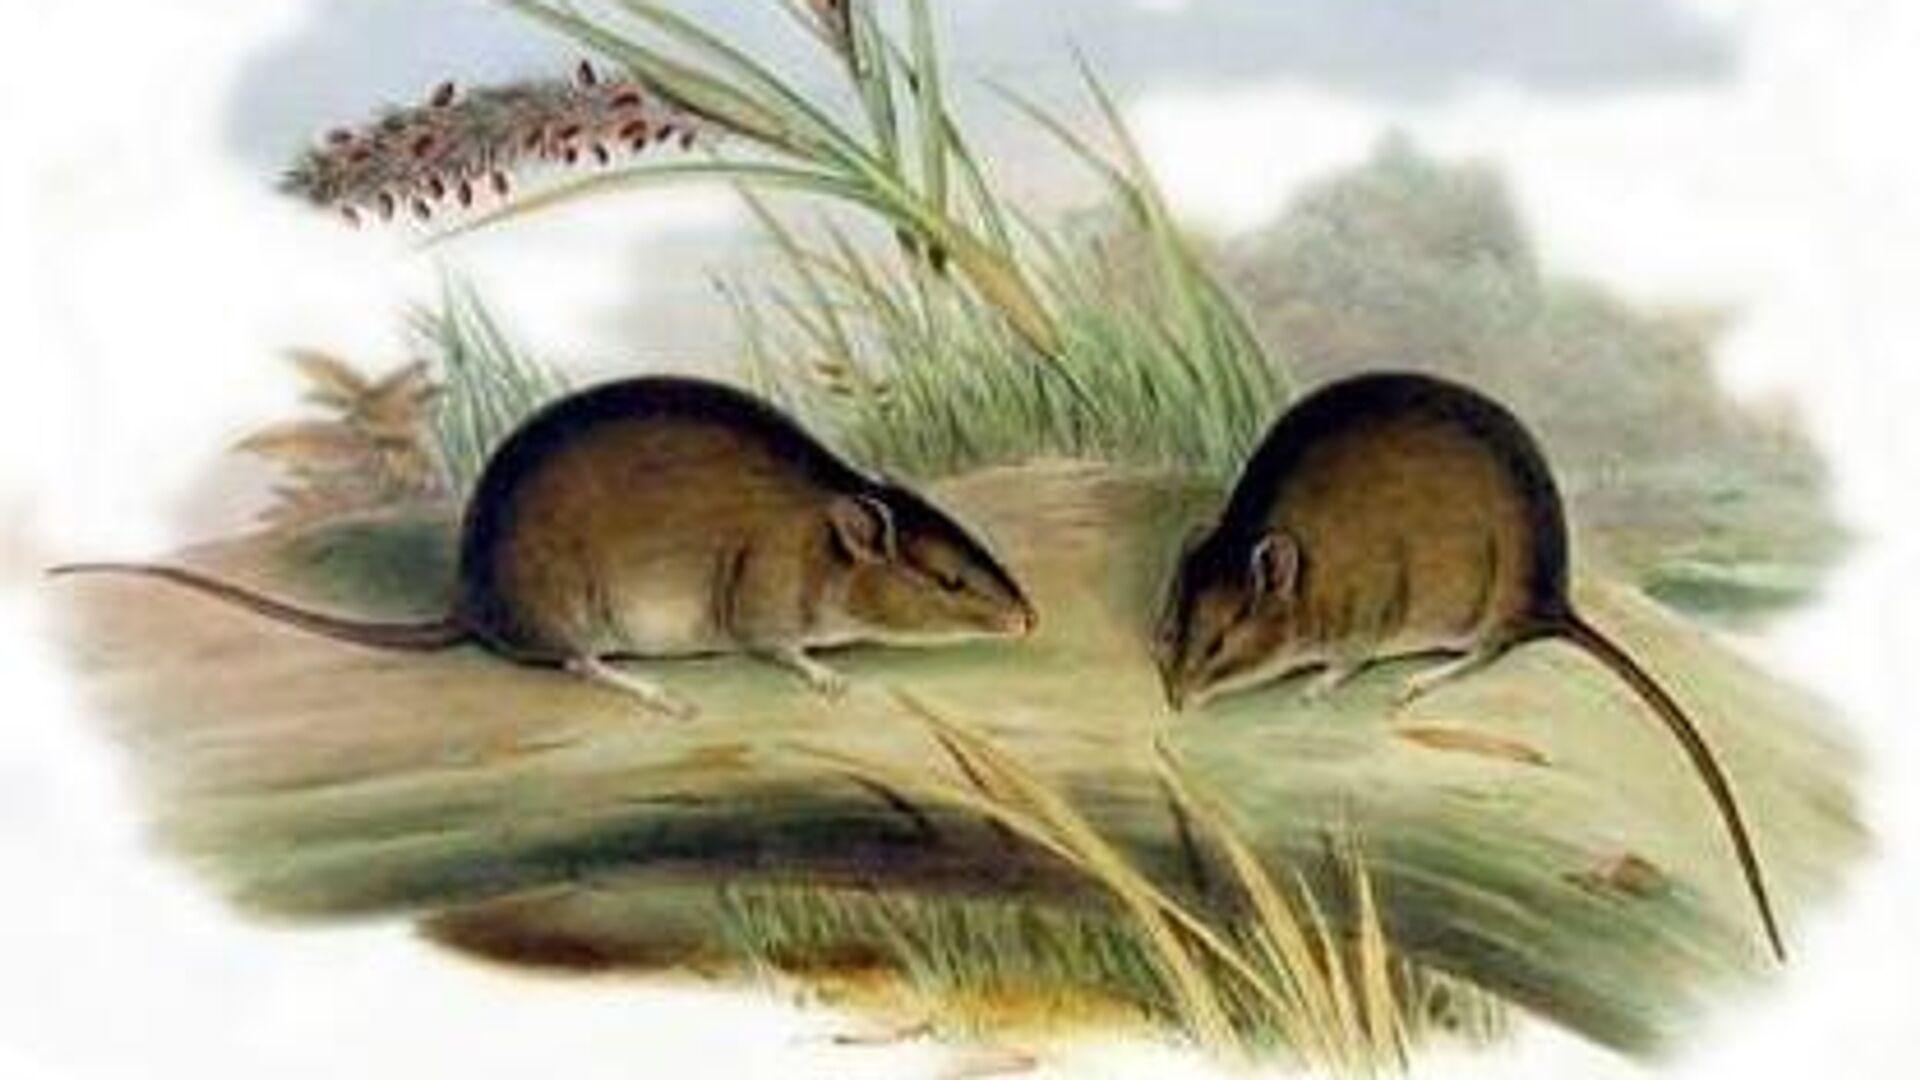 El ratón de Gould (Pseudomys gouldii) - Sputnik Mundo, 1920, 30.06.2021